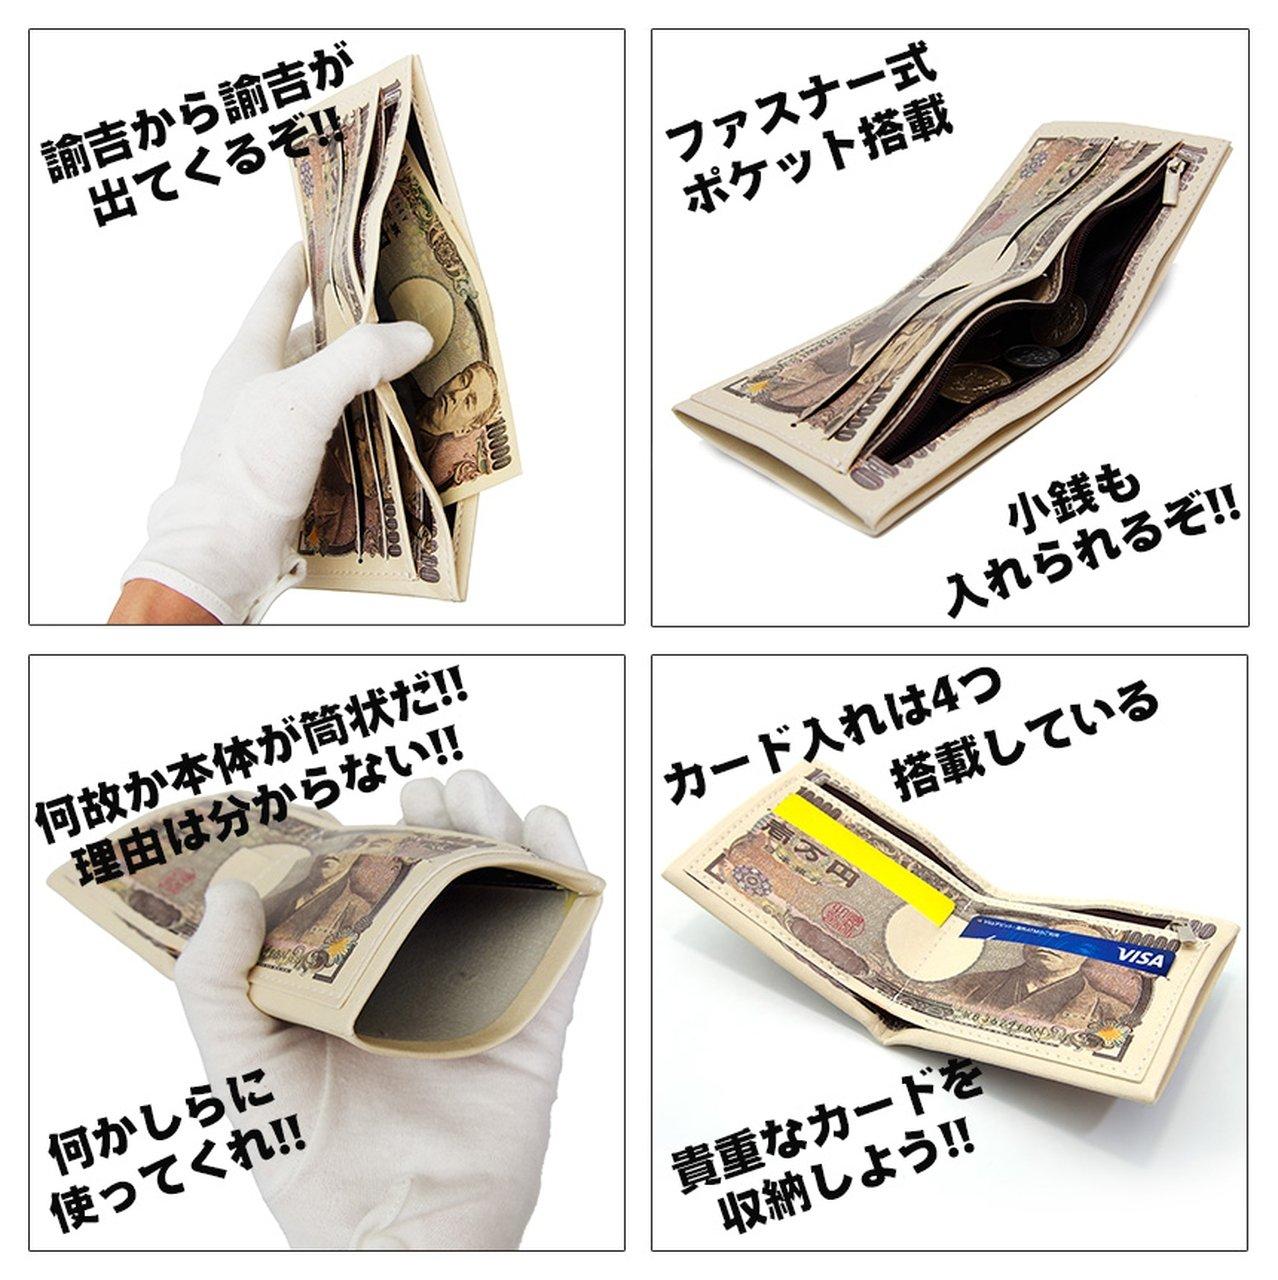 2427759b9e45 Amazon | GoodsLand 【リアル】 一万円 二つ折り 財布 メンズ 小銭 入れ フェイク レザー 福沢 諭吉 プレゼント  GD-YUKICHI | バッグ・財布 | おもちゃ